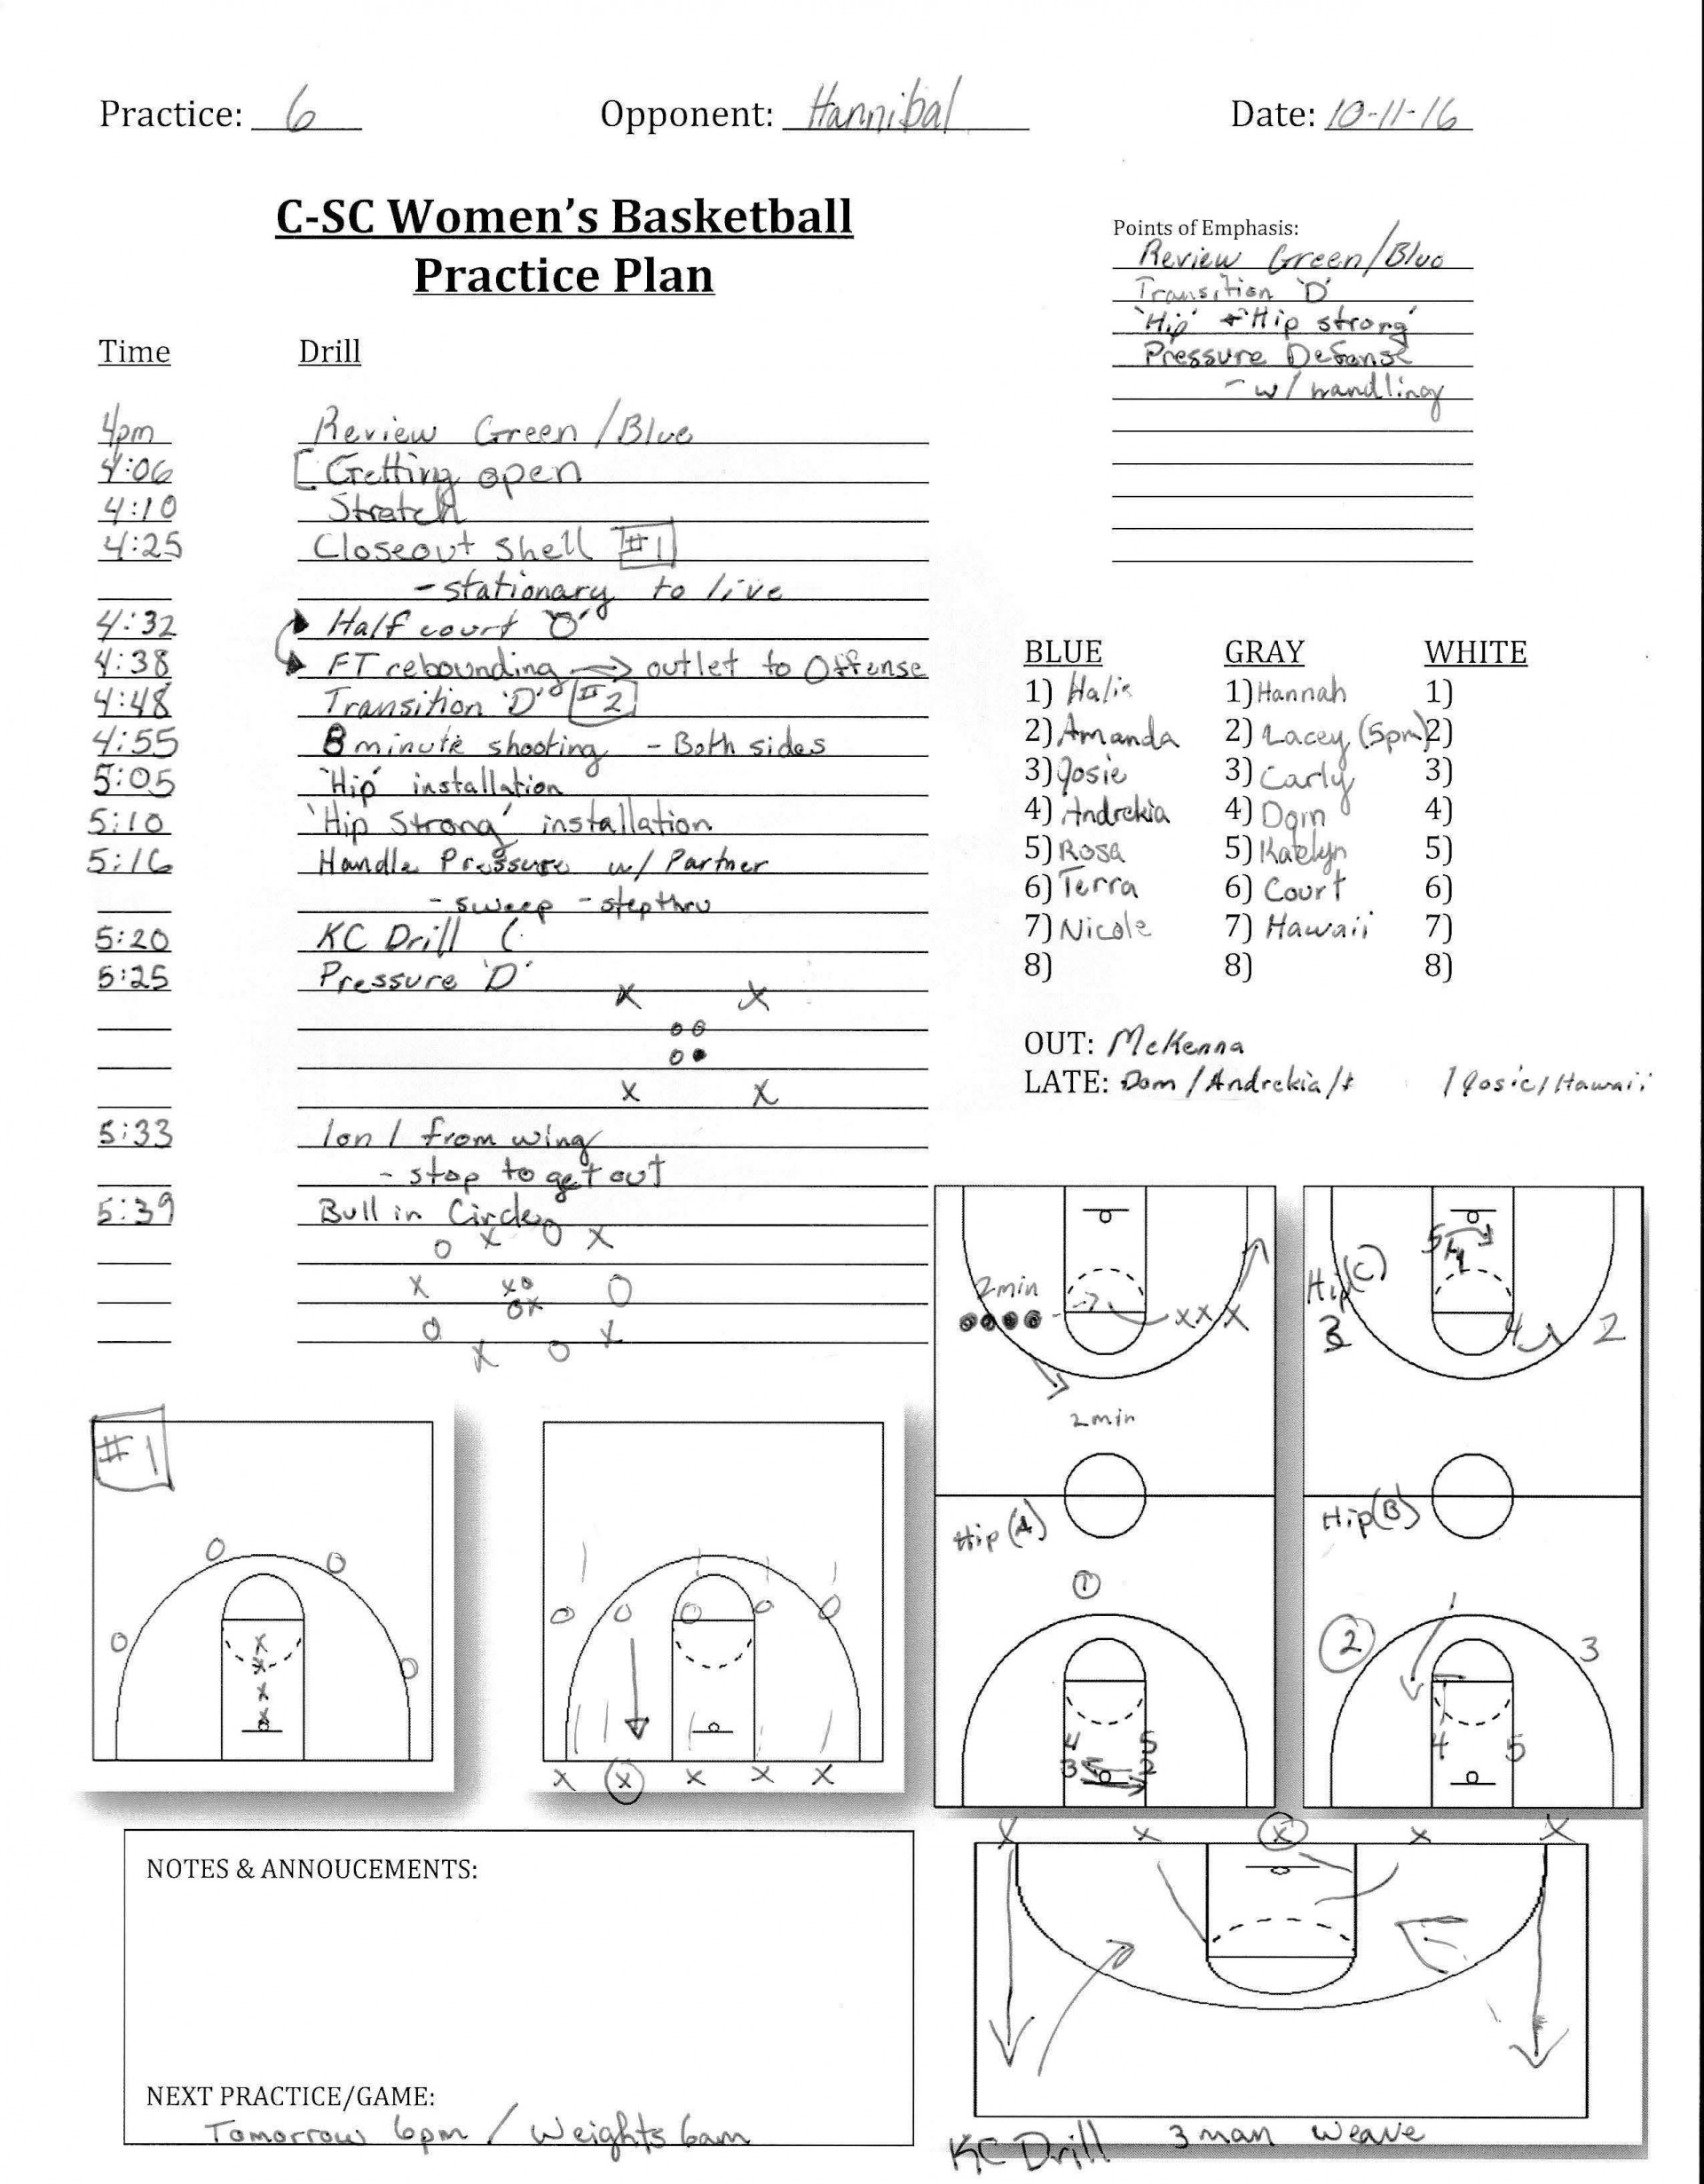 005 Beautiful Basketball Practice Plan Template Image  Pdf Fillable Google Doc1920